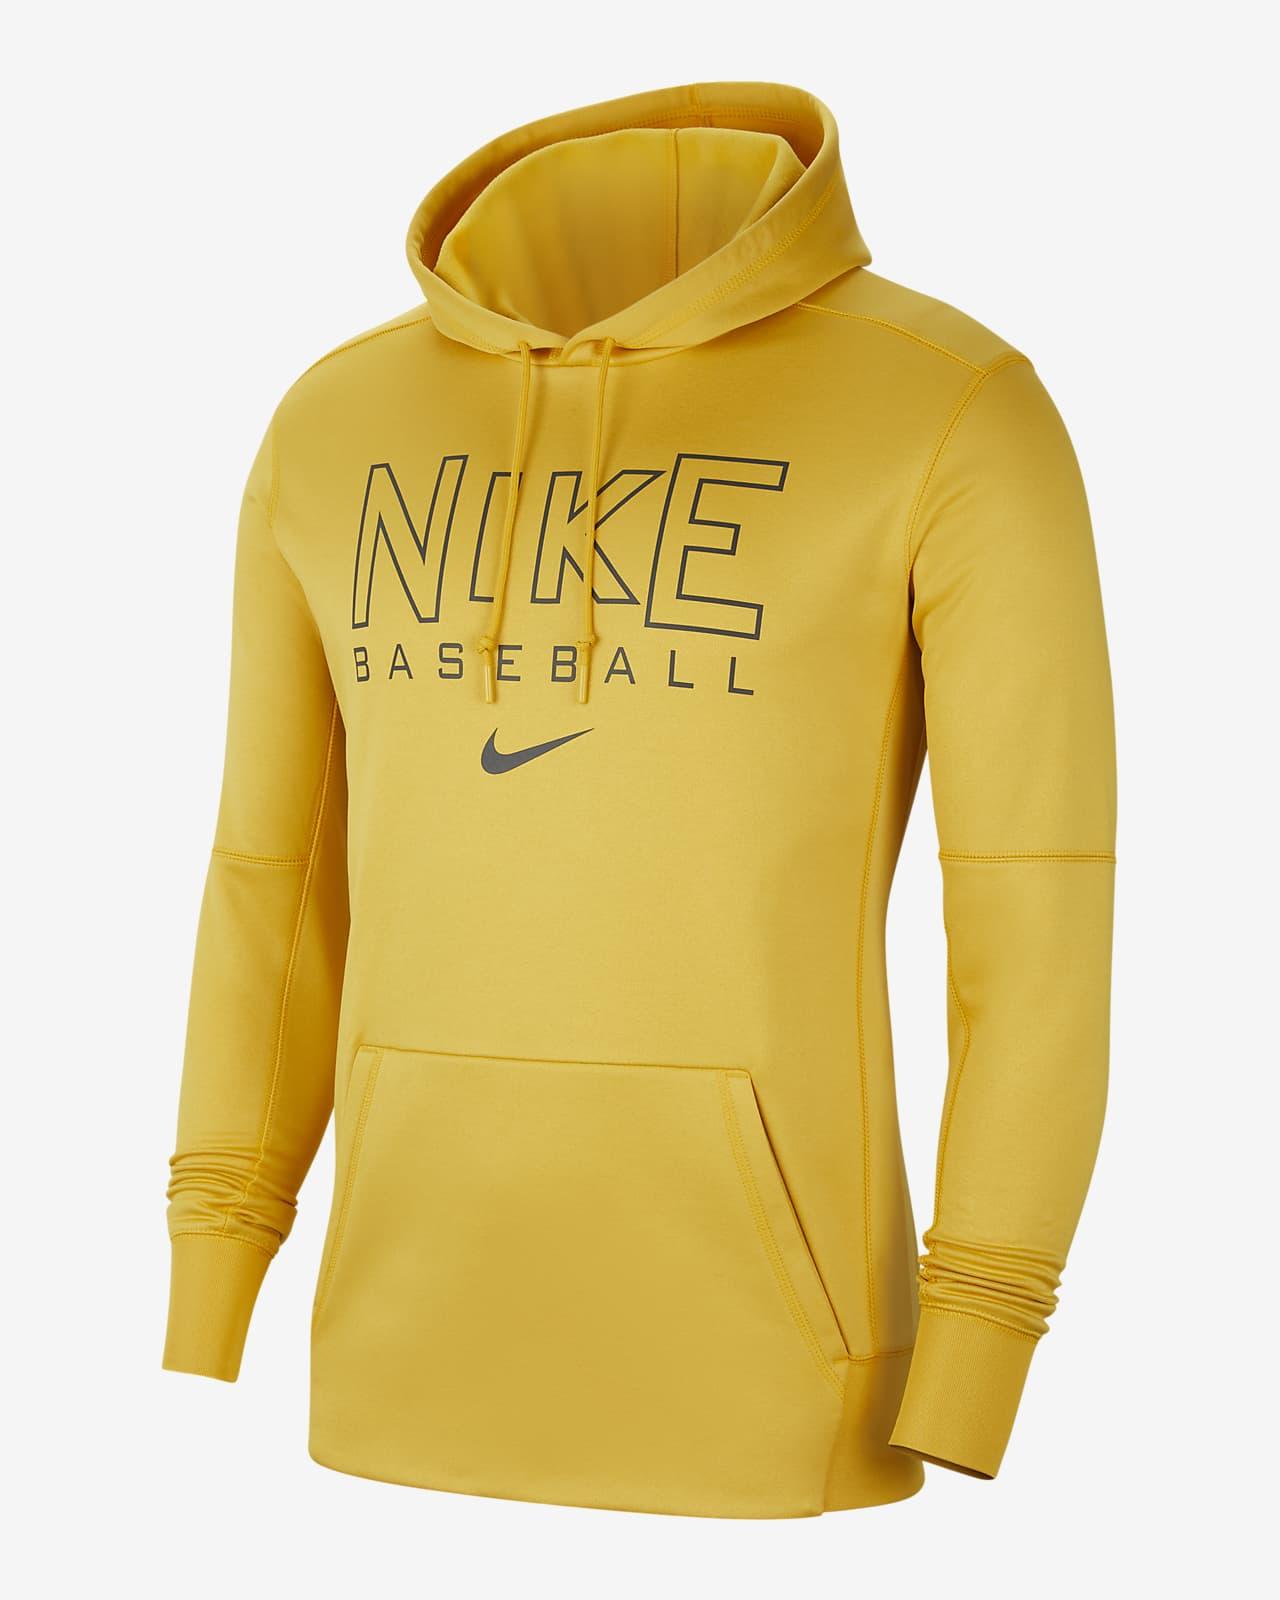 Nike Therma-FIT Men's Baseball Hoodie